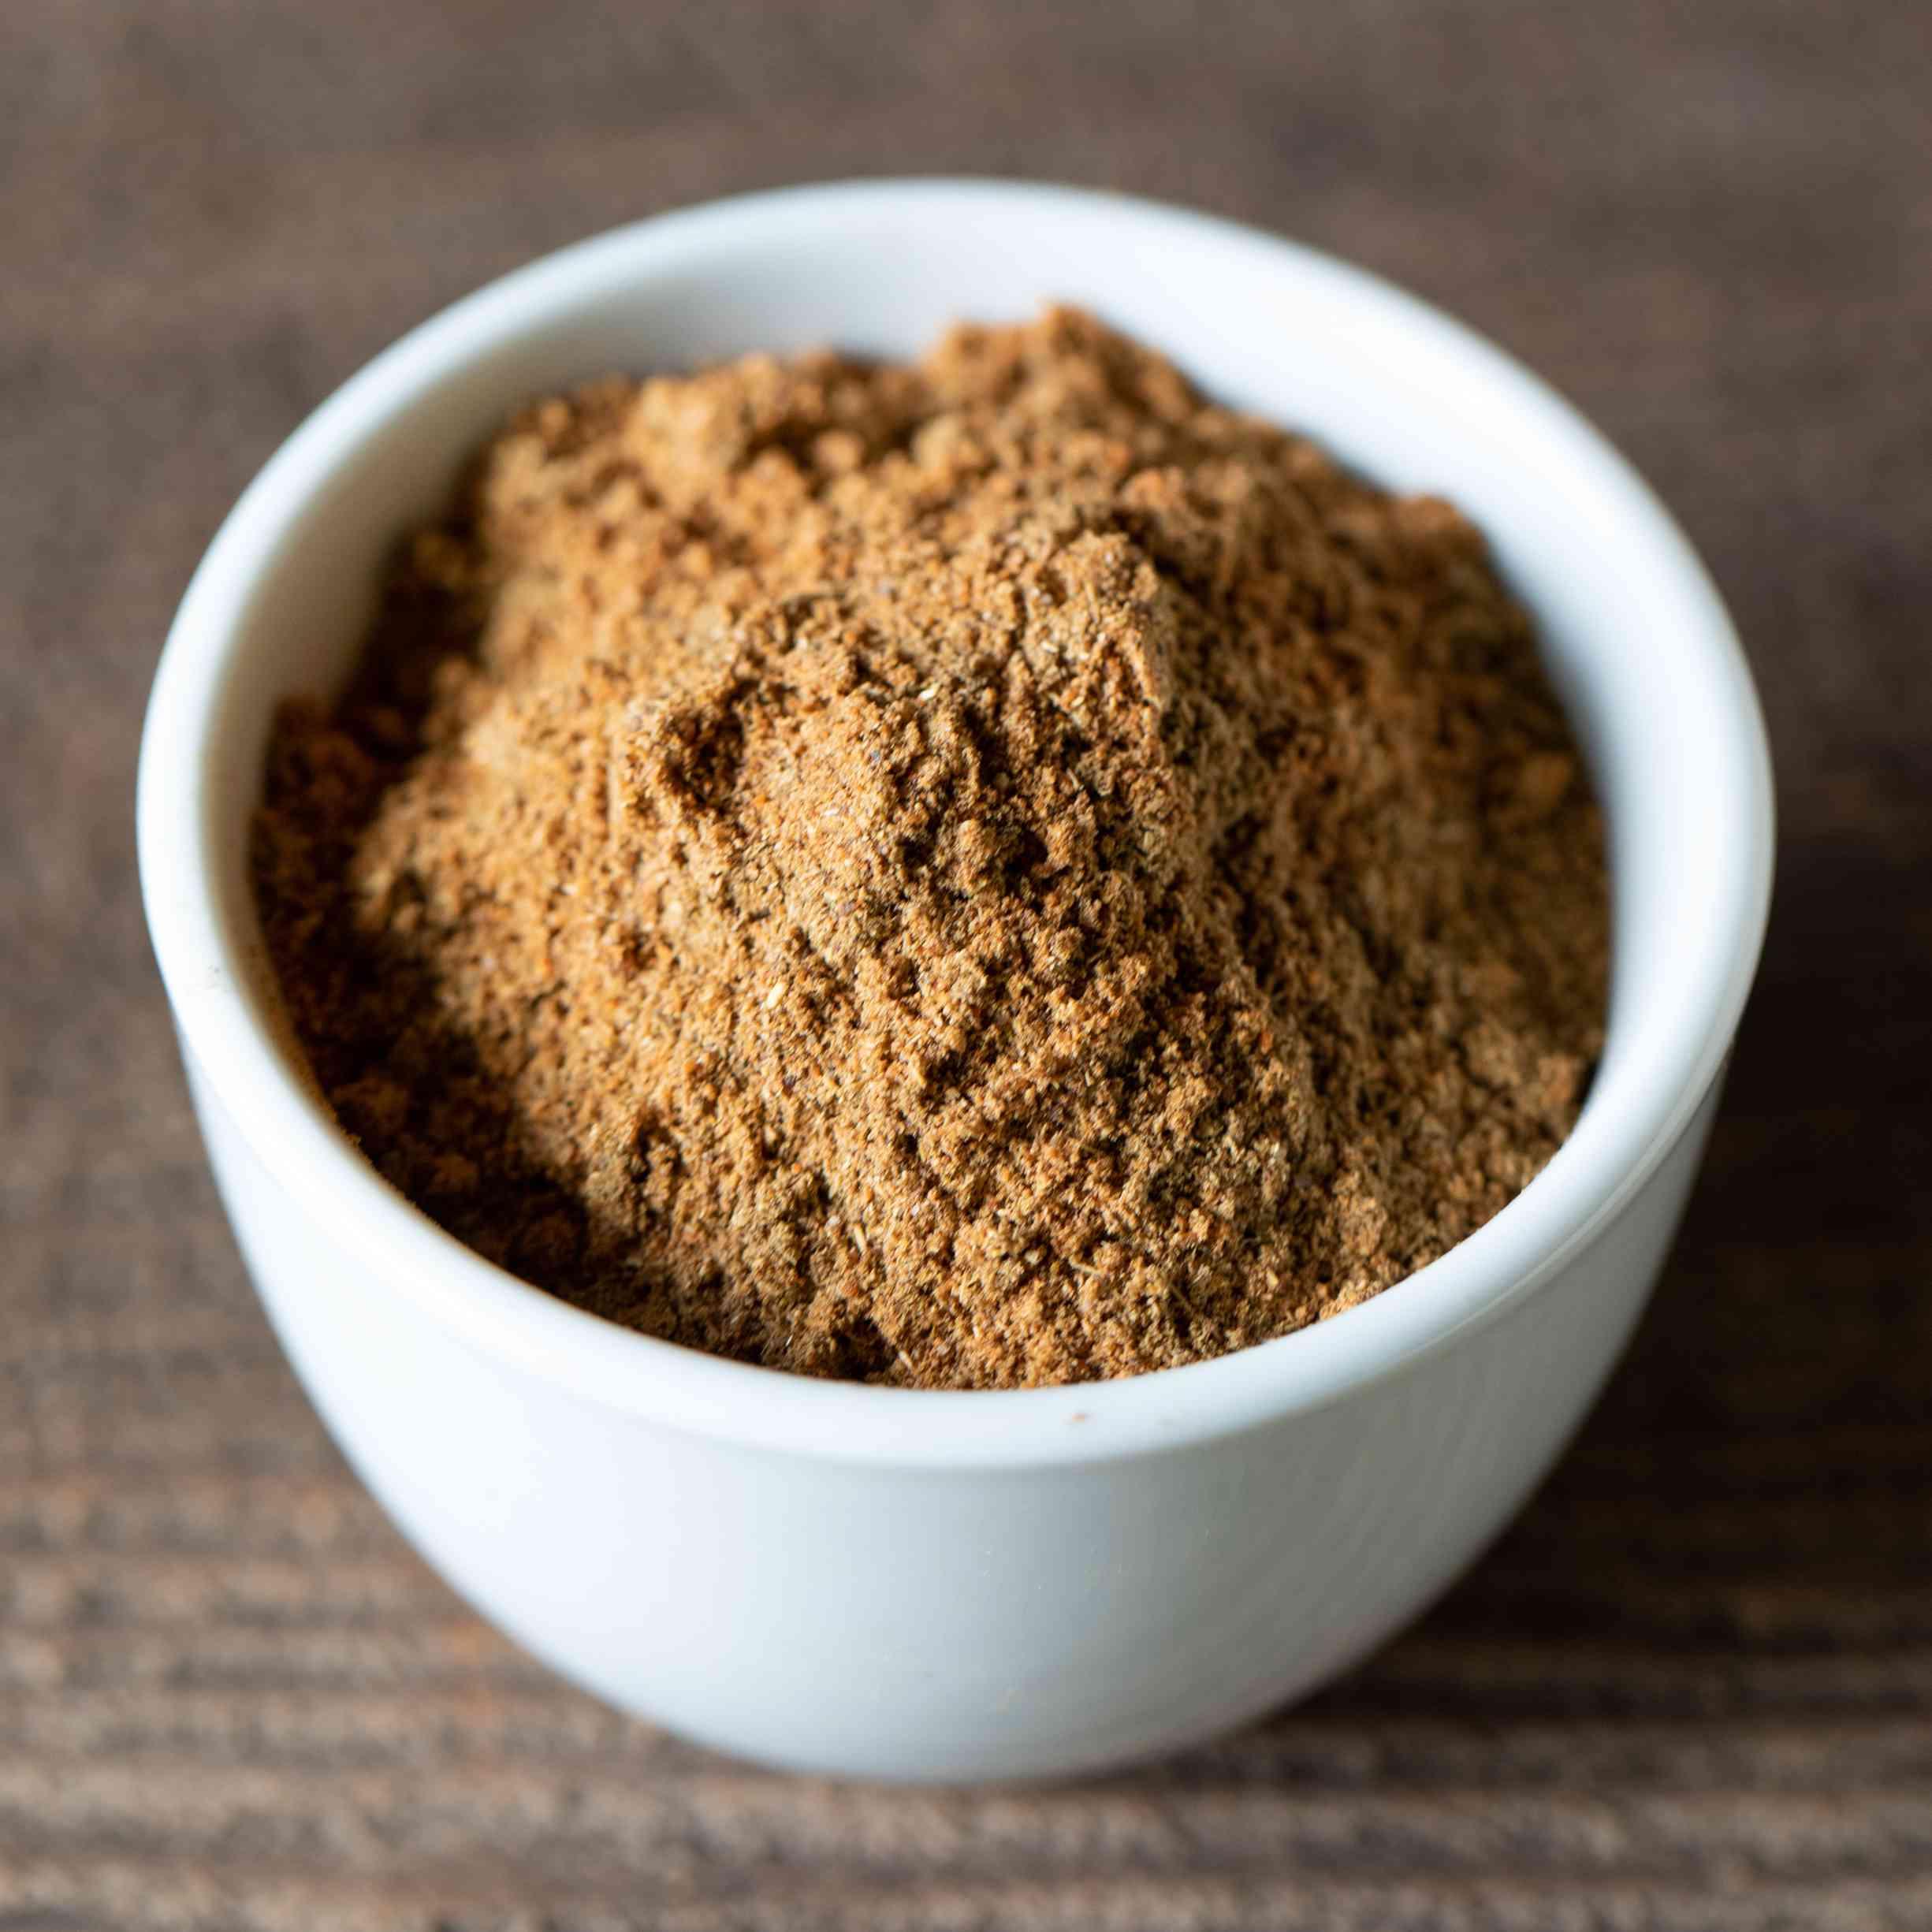 ground garam masala Indian spice mix in a white bowl